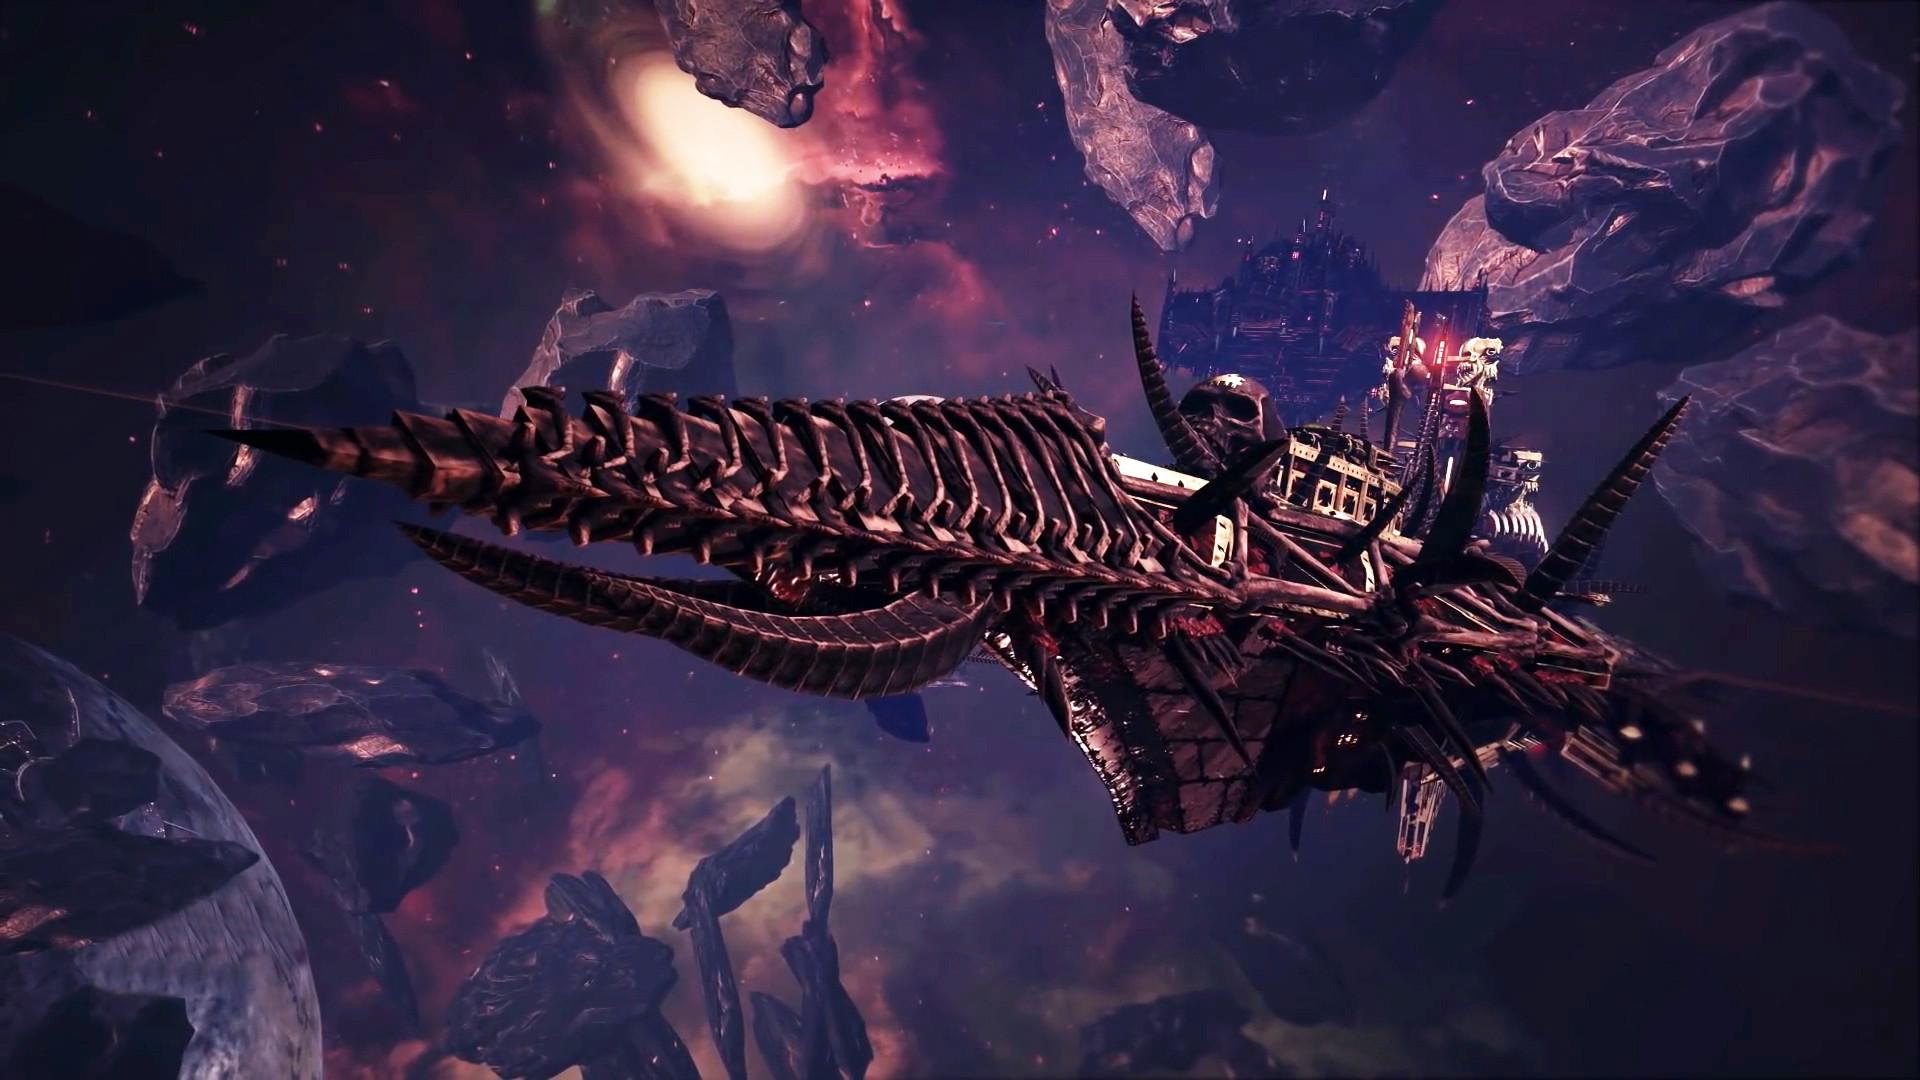 16 Battlefleet Gothic: Armada HD Wallpapers   Backgrounds – Wallpaper Abyss